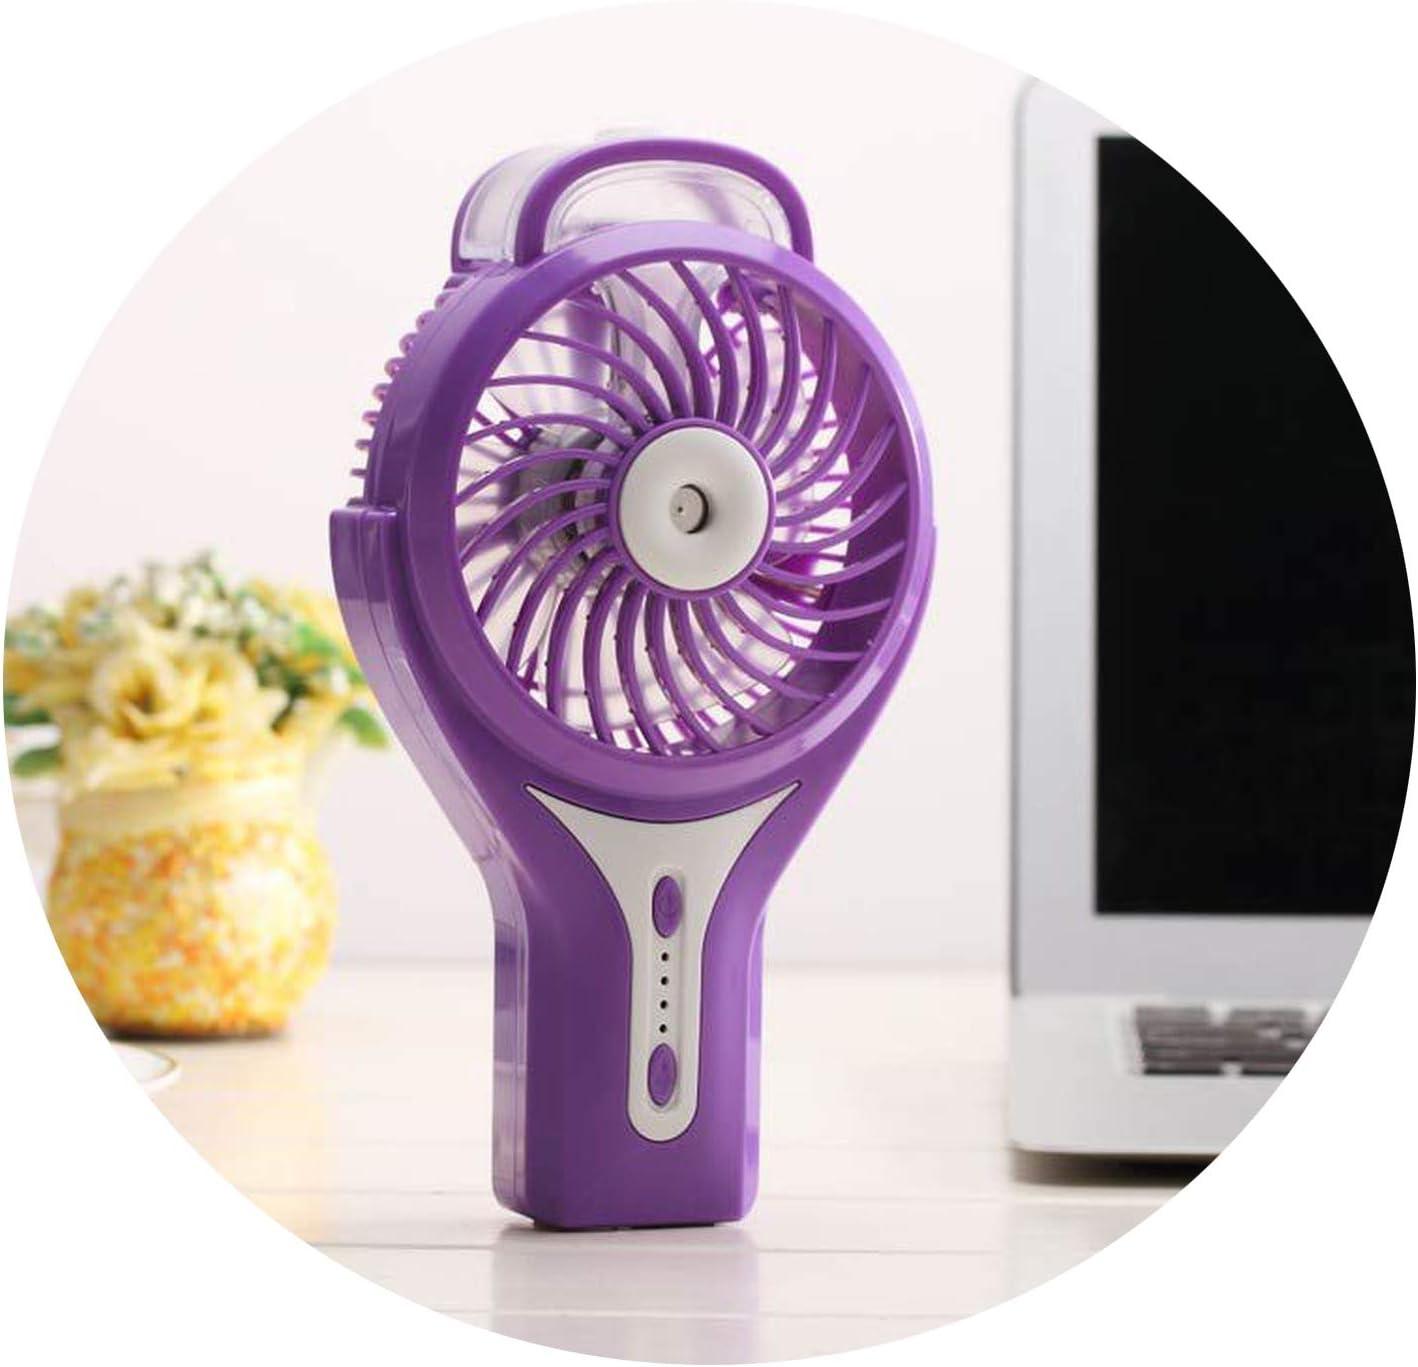 2019 Hot Three Settings Electric Desk Misting USB Handheld Mini Water Spray Fan Handheld USB Electric Mini Hand Fan,Red